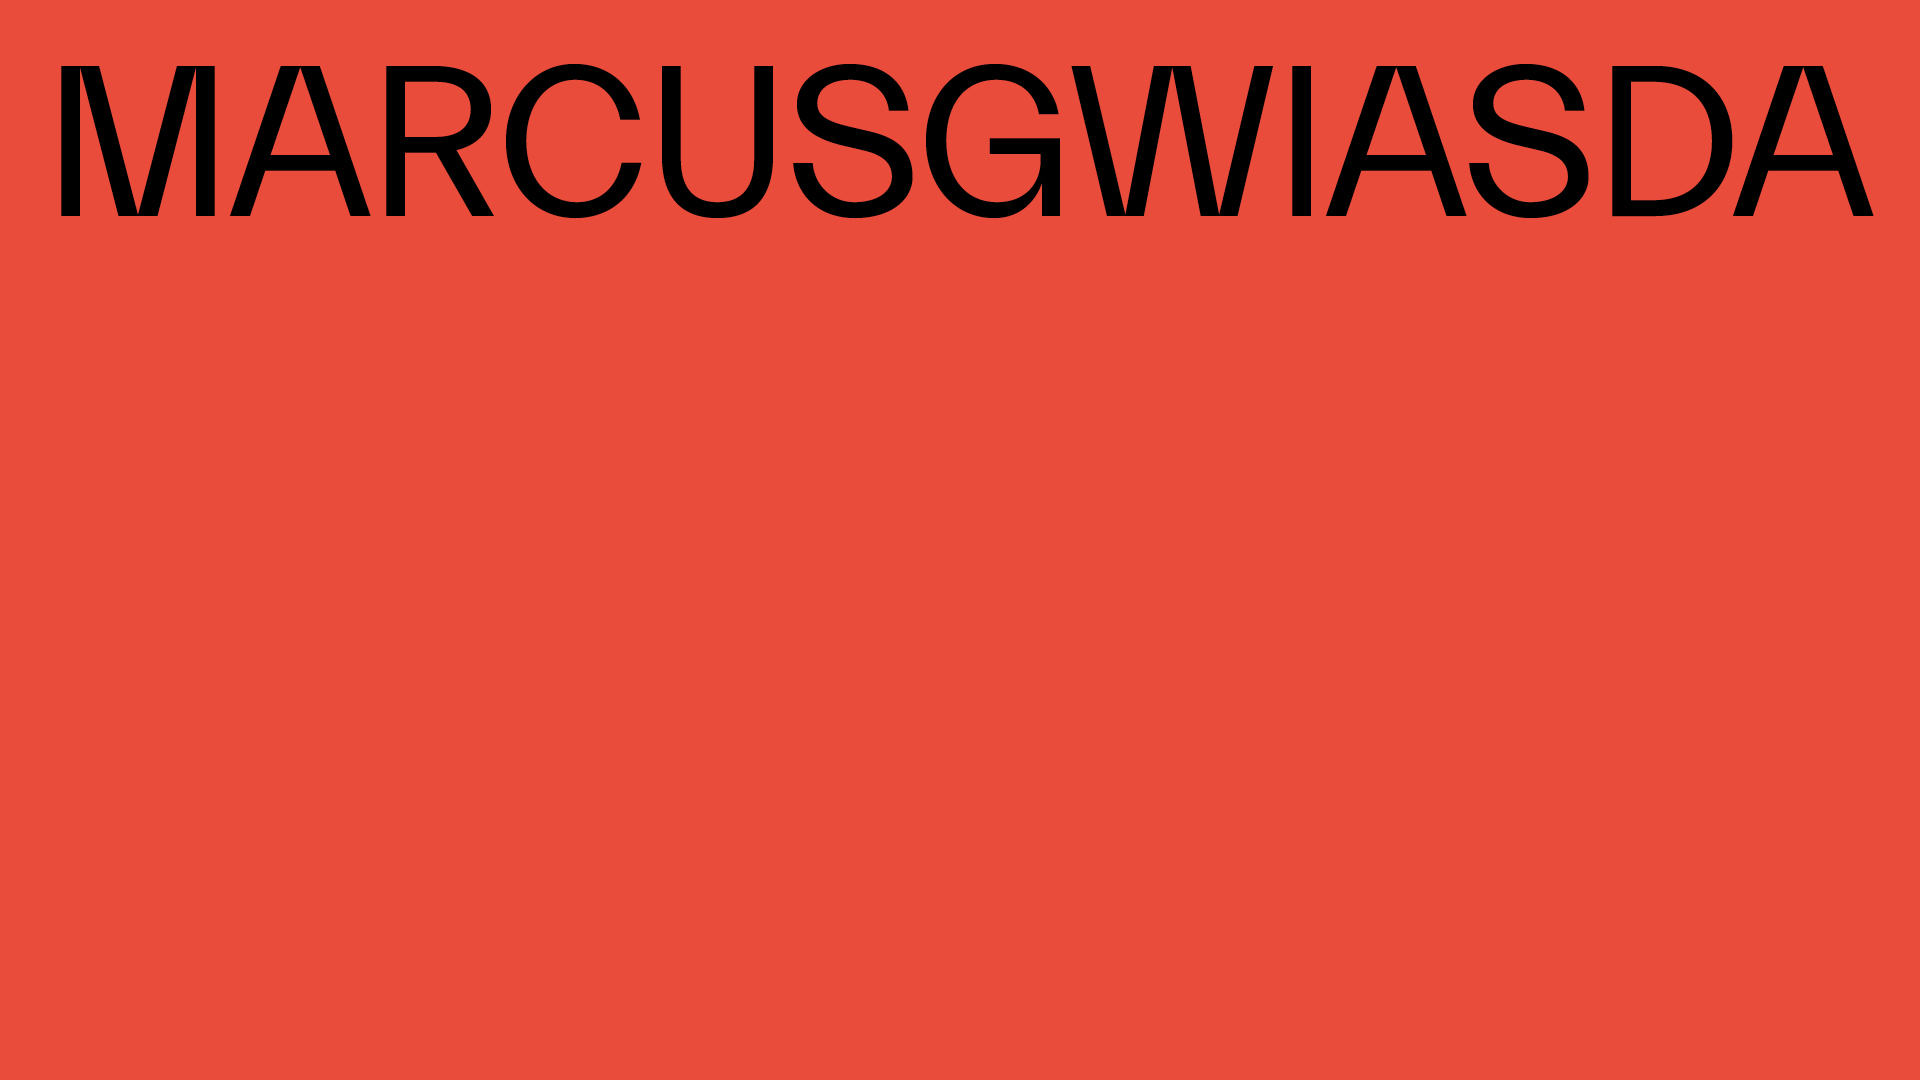 VISEE_MGW_CD-Entwicklung_Praesentation_v026